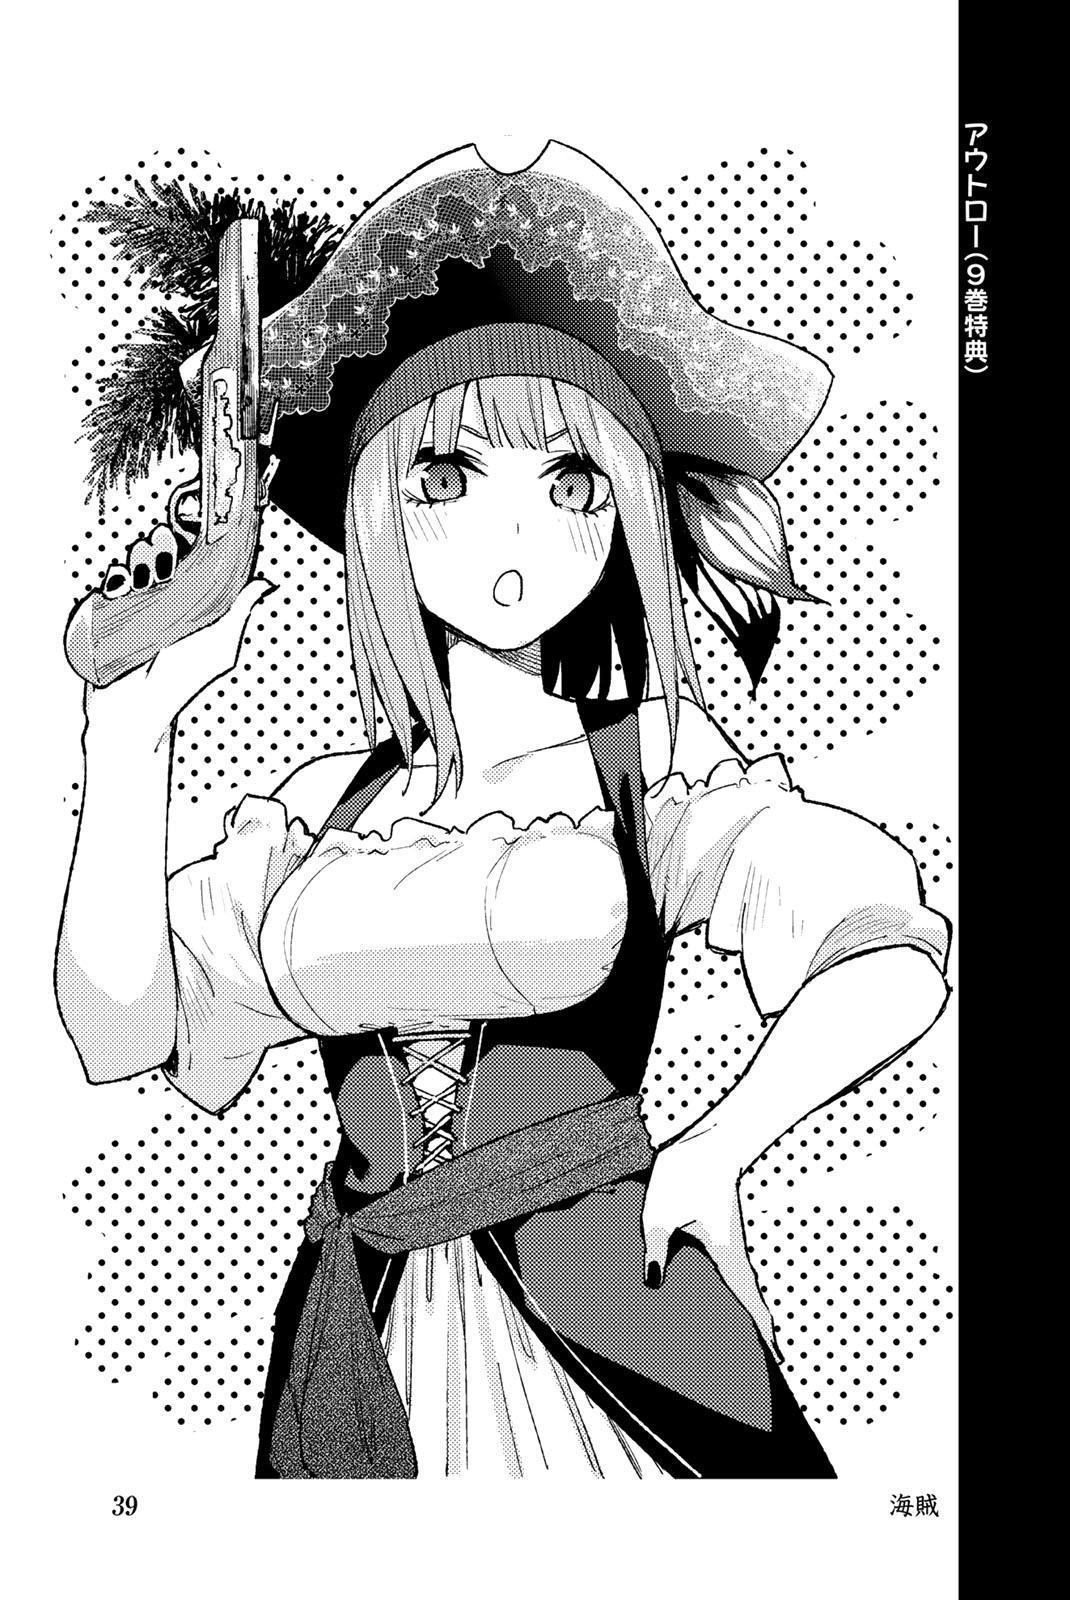 Go-Toubun No Hanayome Vol.14 Chapter 122.5: Vol 14 Extras page 49 - Mangakakalot